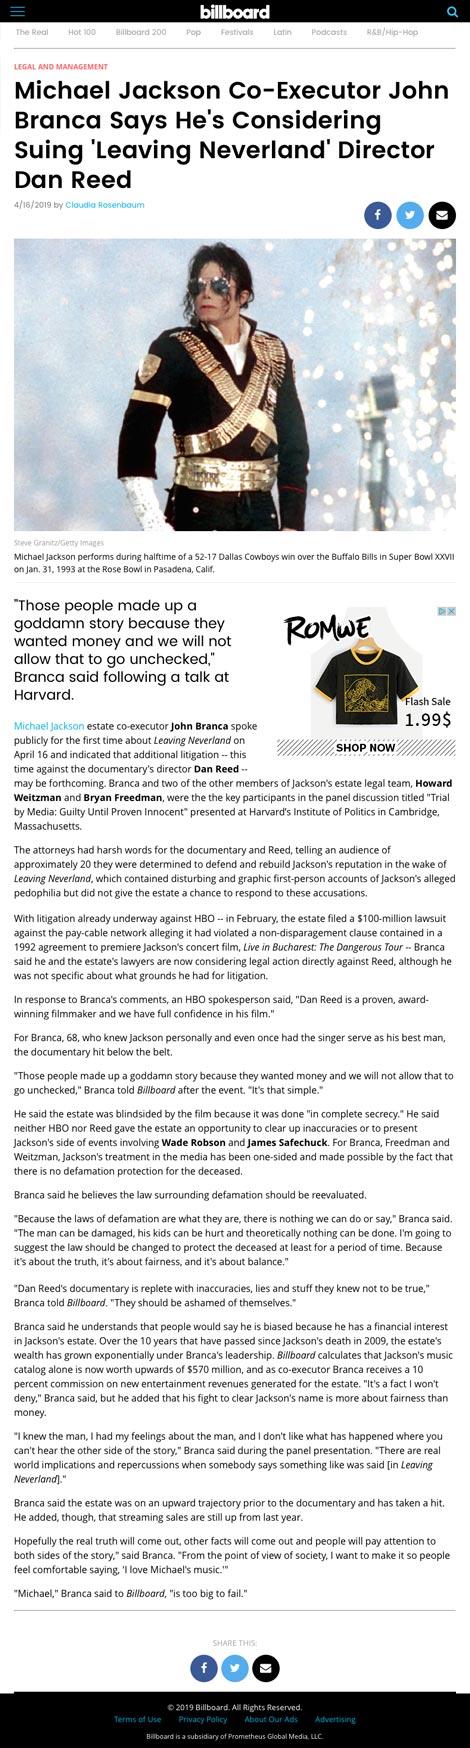 Michael Jackson Co-Executor John Branca Says He's Considering Suing 'Leaving Neverland' Director Dan Reed - article by Billboard.com